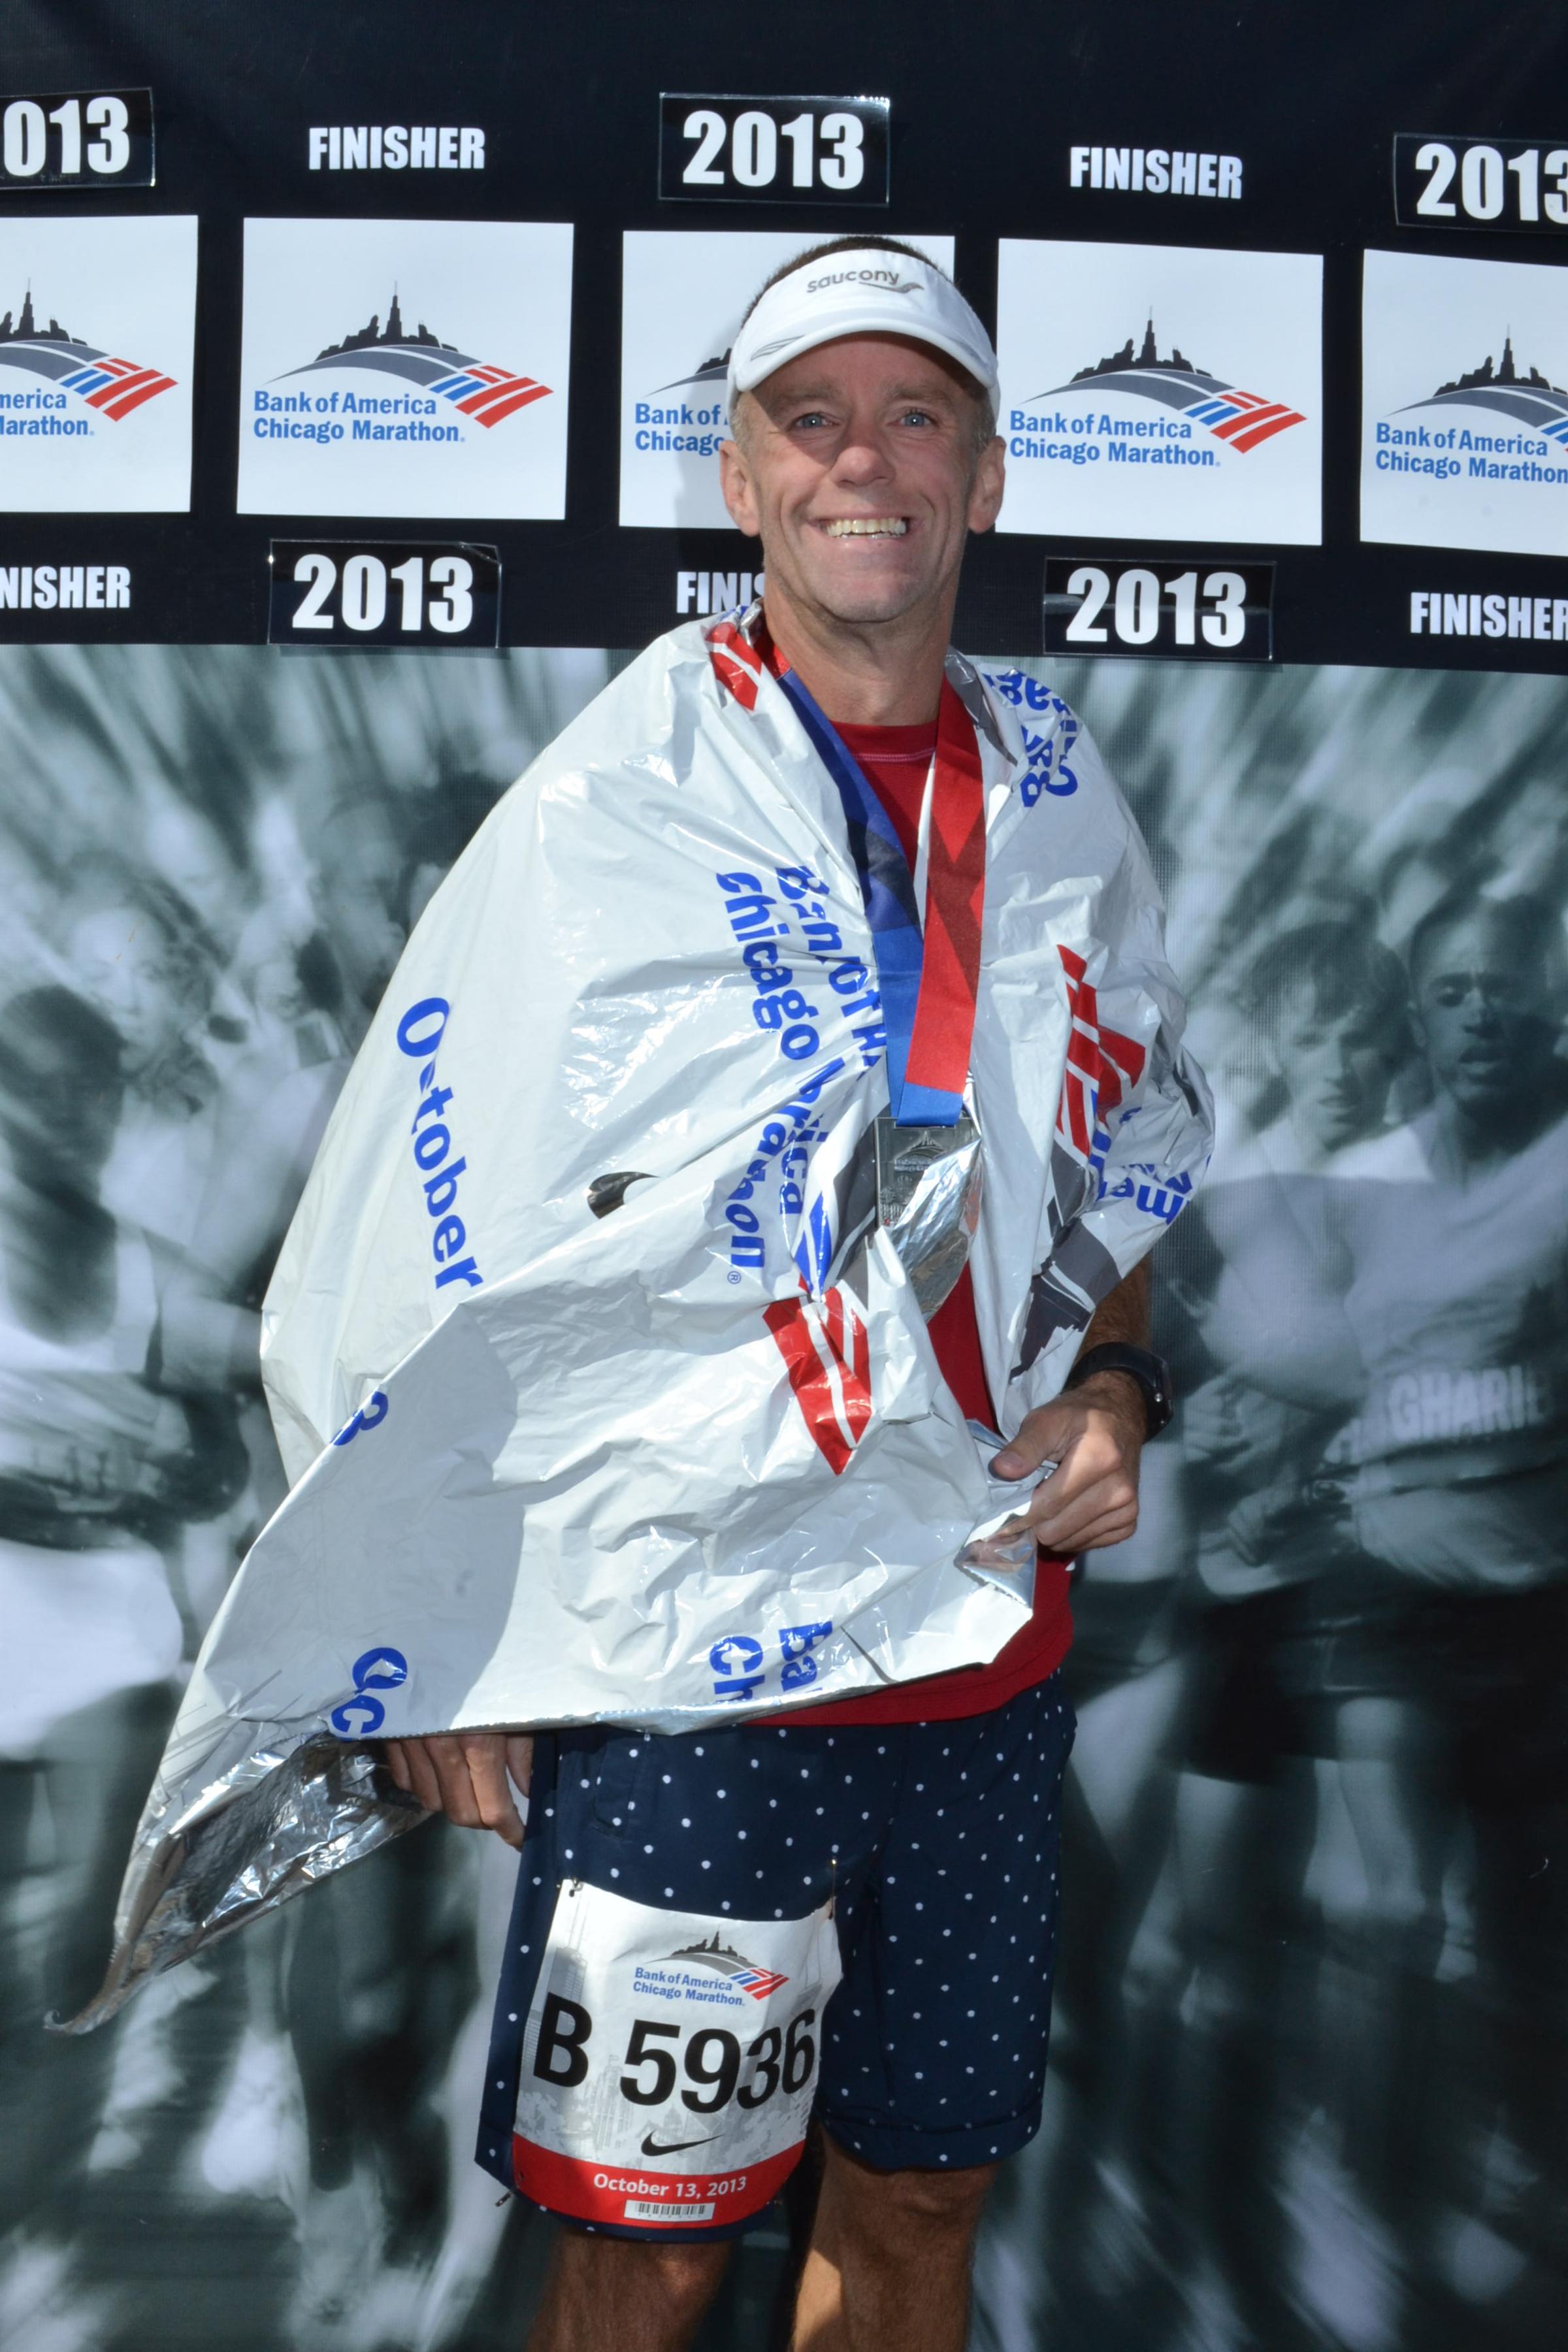 2013 Bank of America Chicago Marathon (3:10:17 BQ)